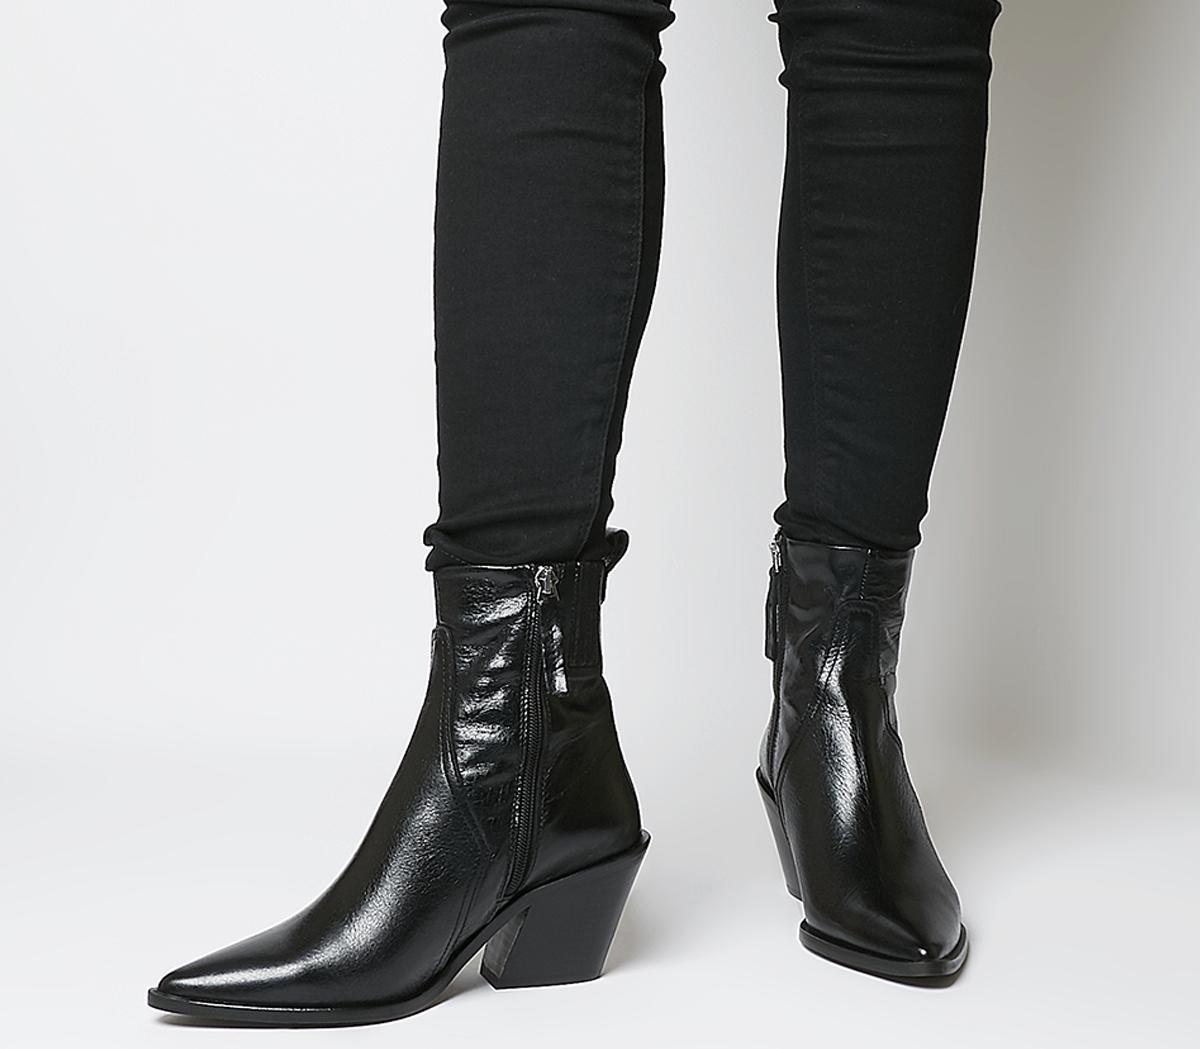 Americano Western Boots